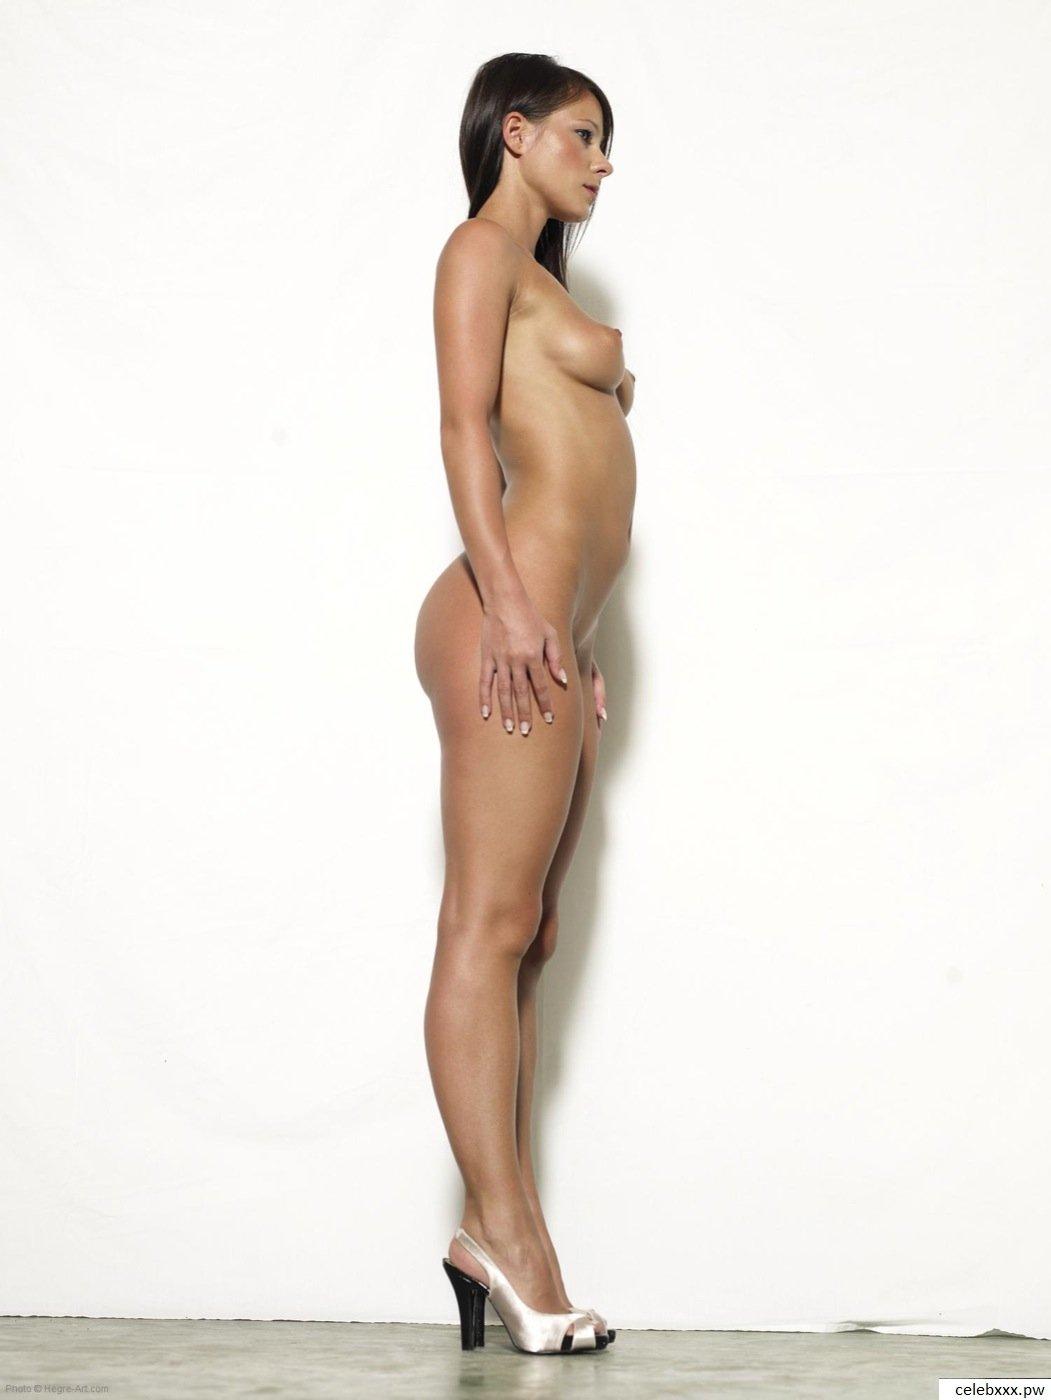 Monica Raymund hot photo